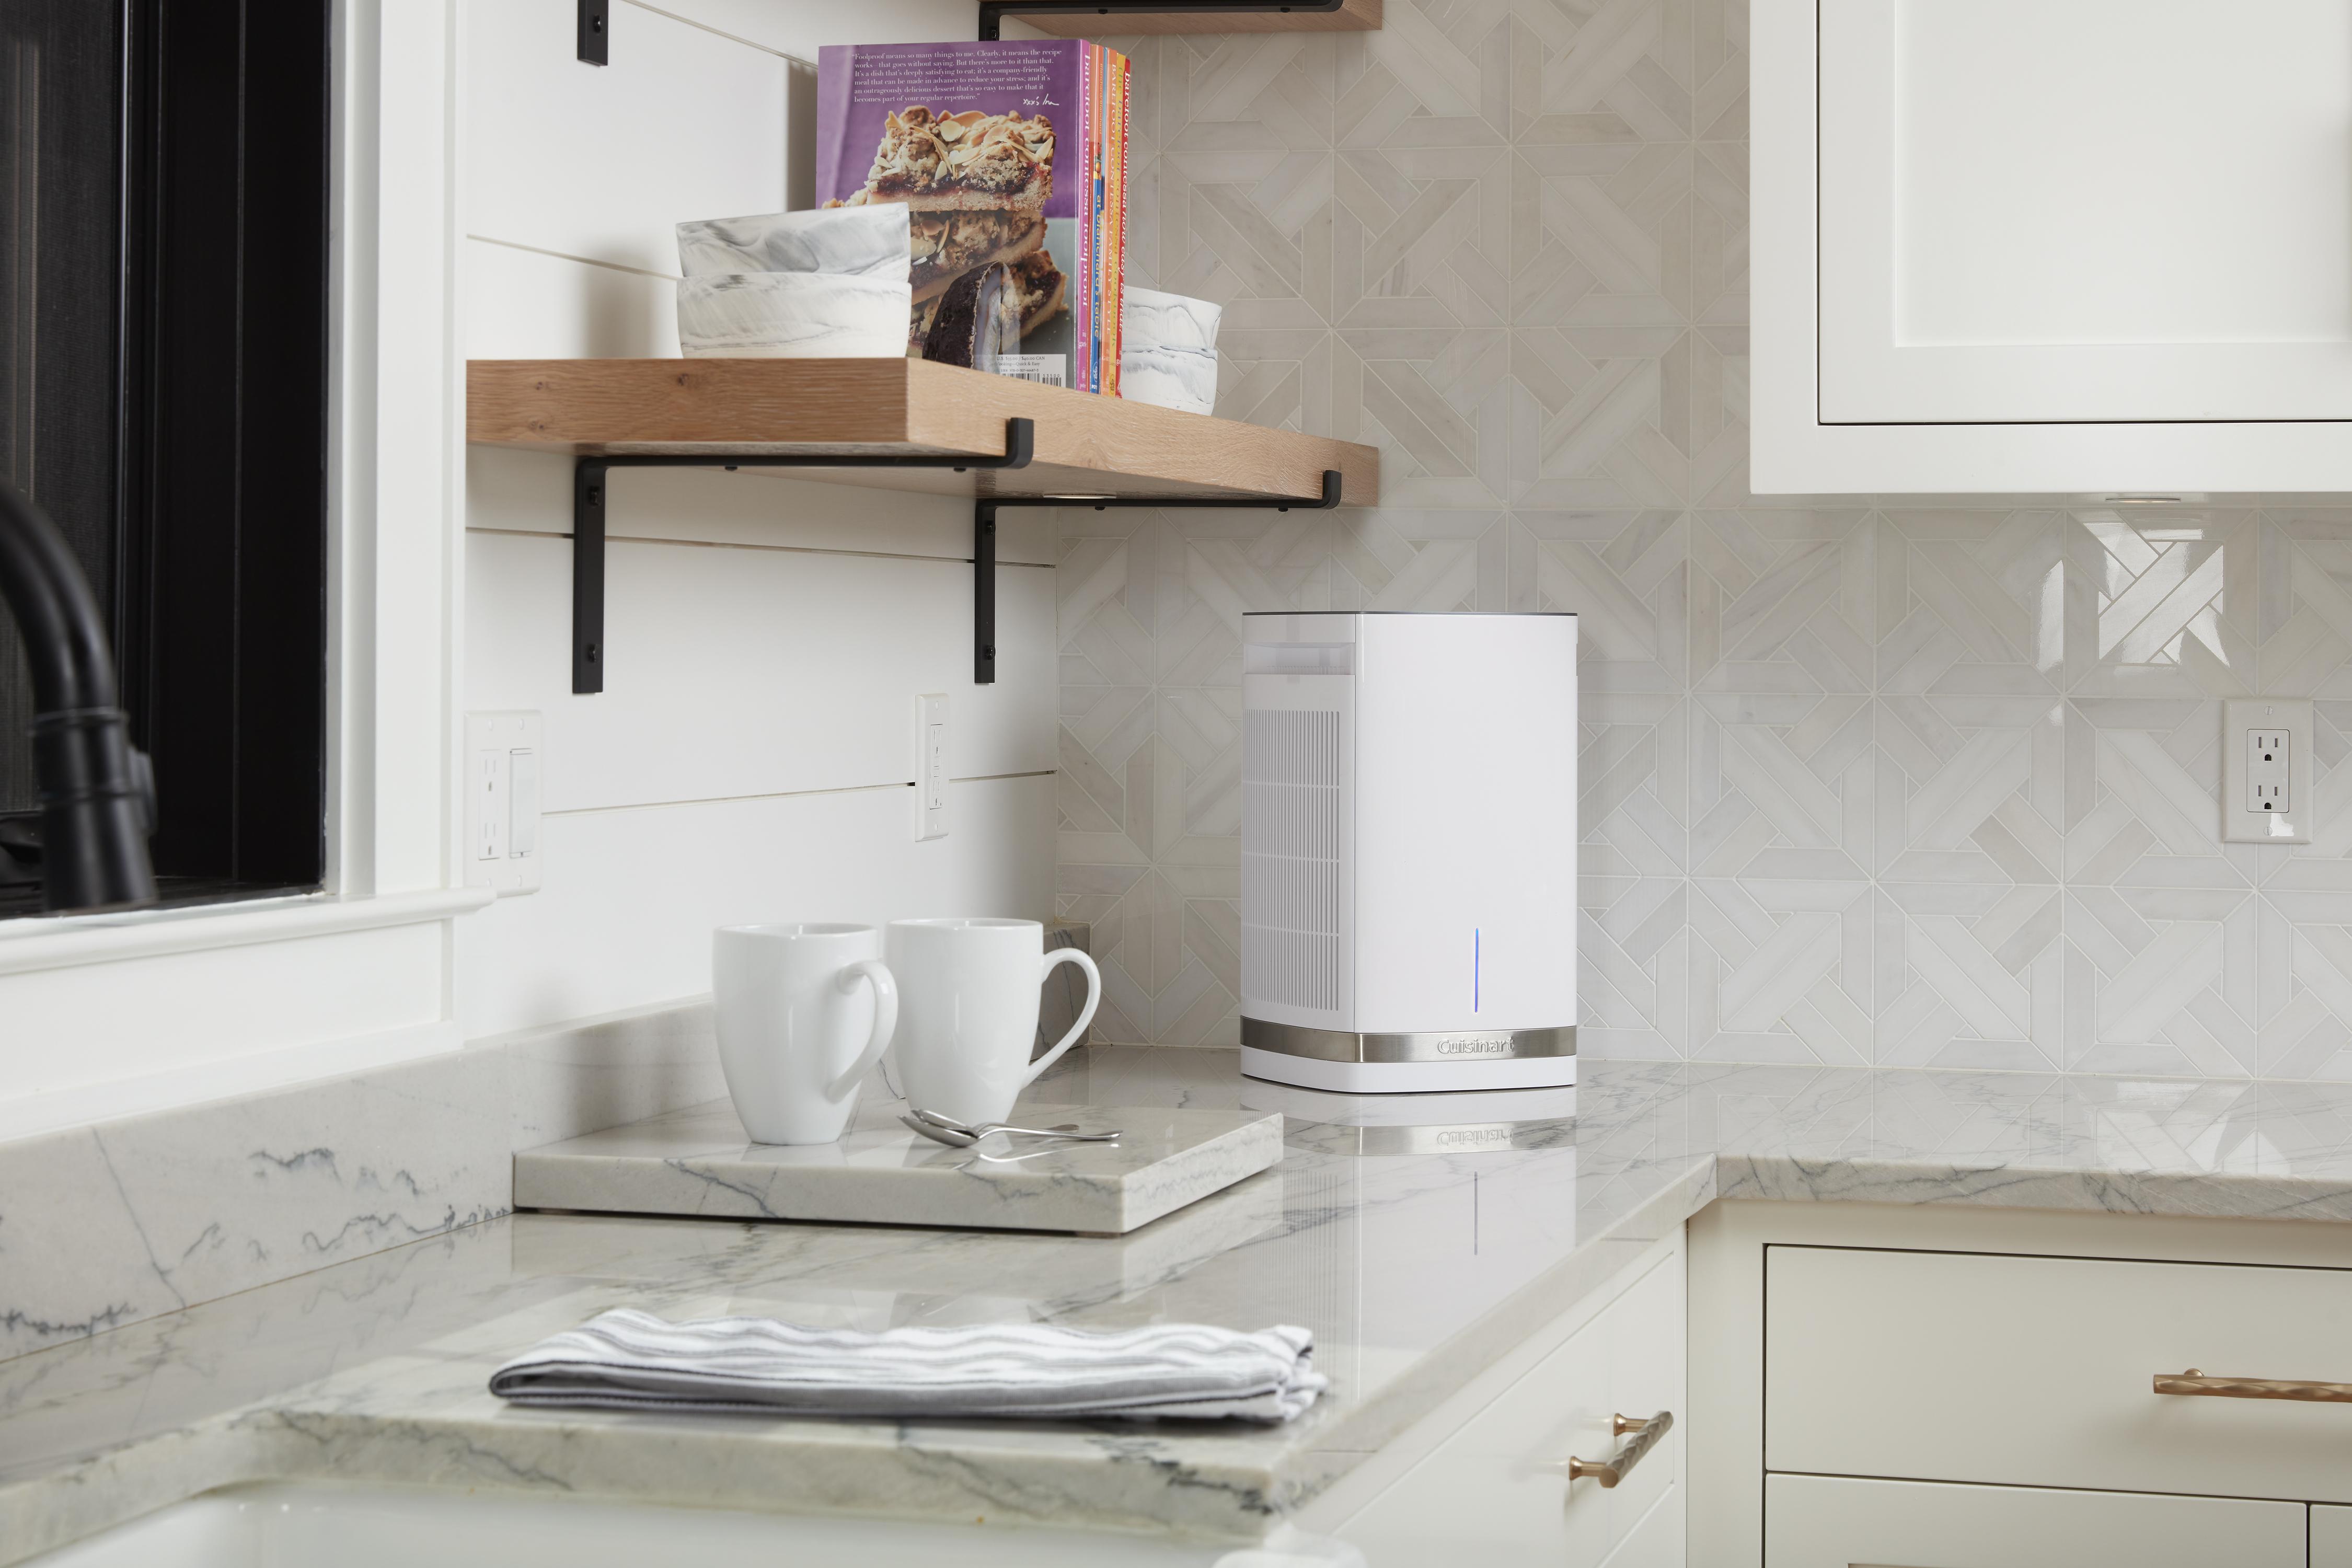 PuRXium Medium Room/Countertop Air Purifier